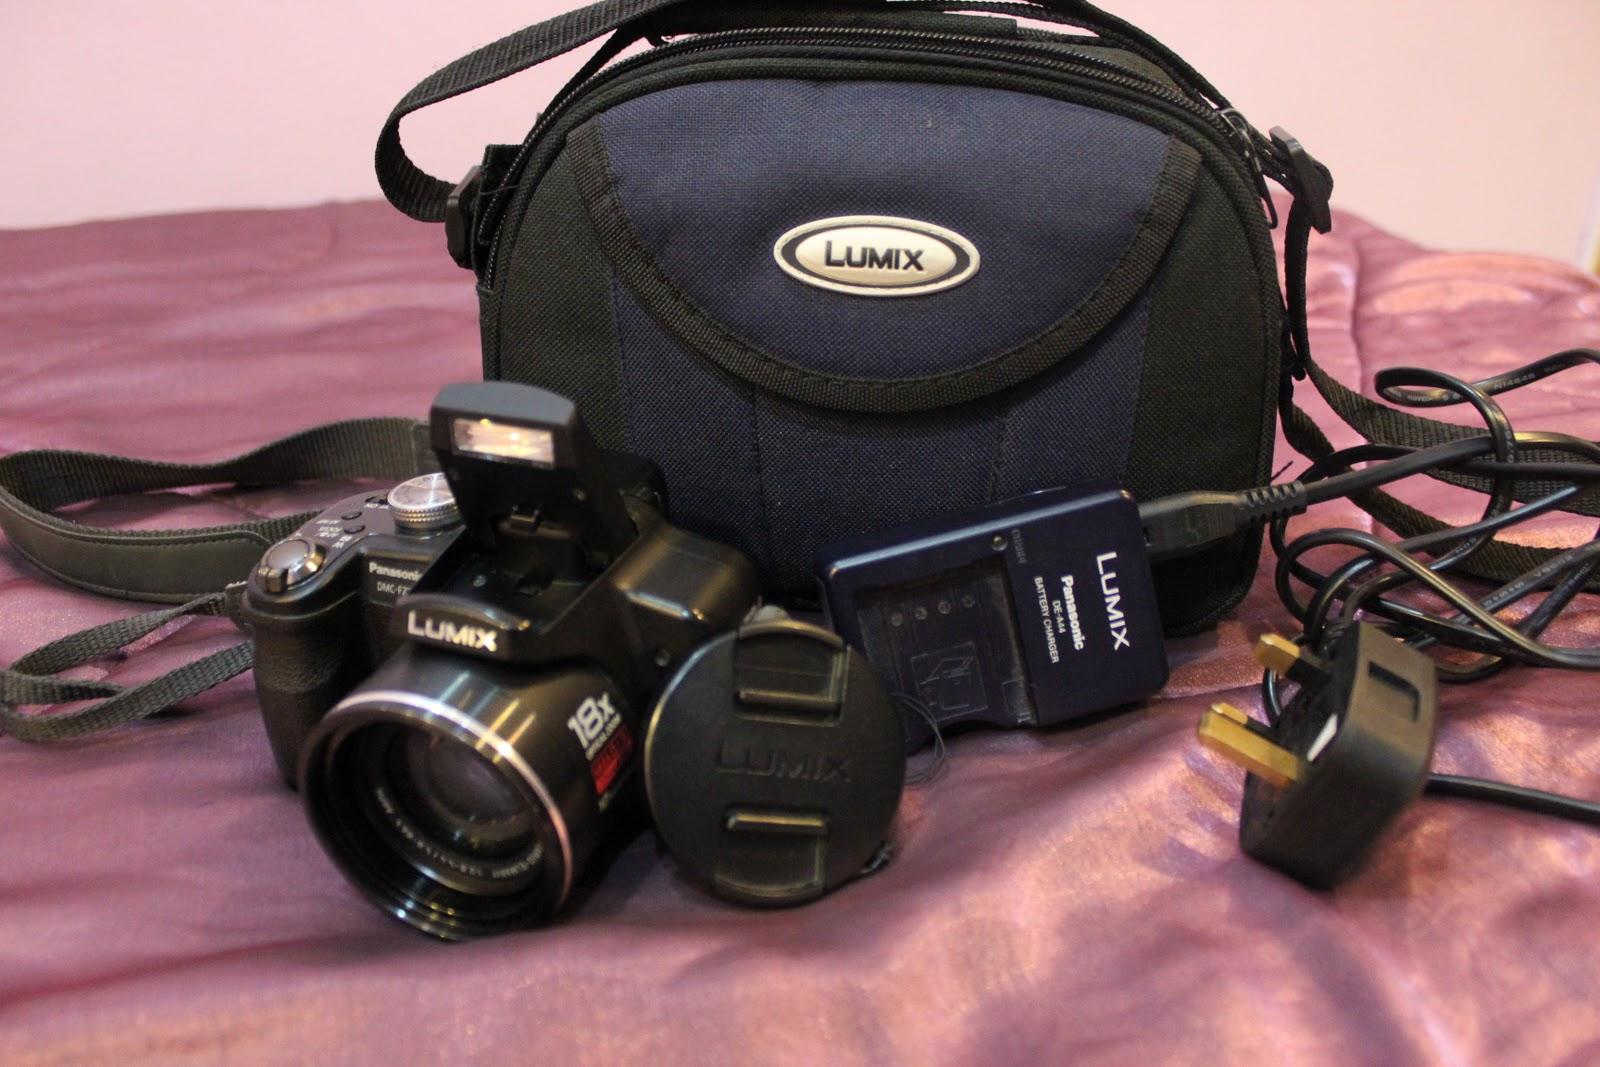 ravishing clothes panasonic lumix dmc fz28 camera. Black Bedroom Furniture Sets. Home Design Ideas